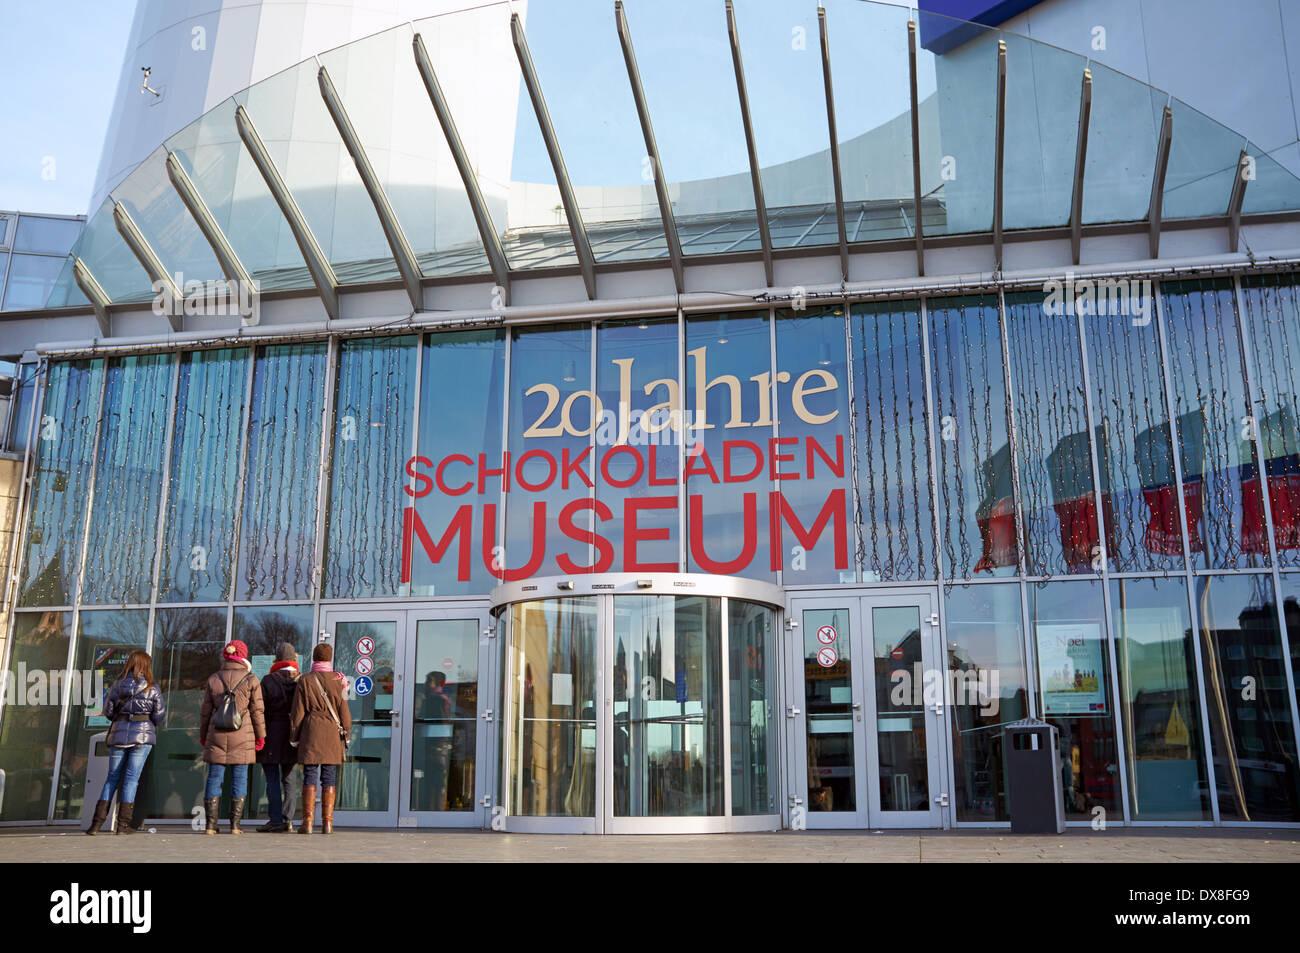 Schokoladen Chocolate Museum Cologne Stock Photo 67799993